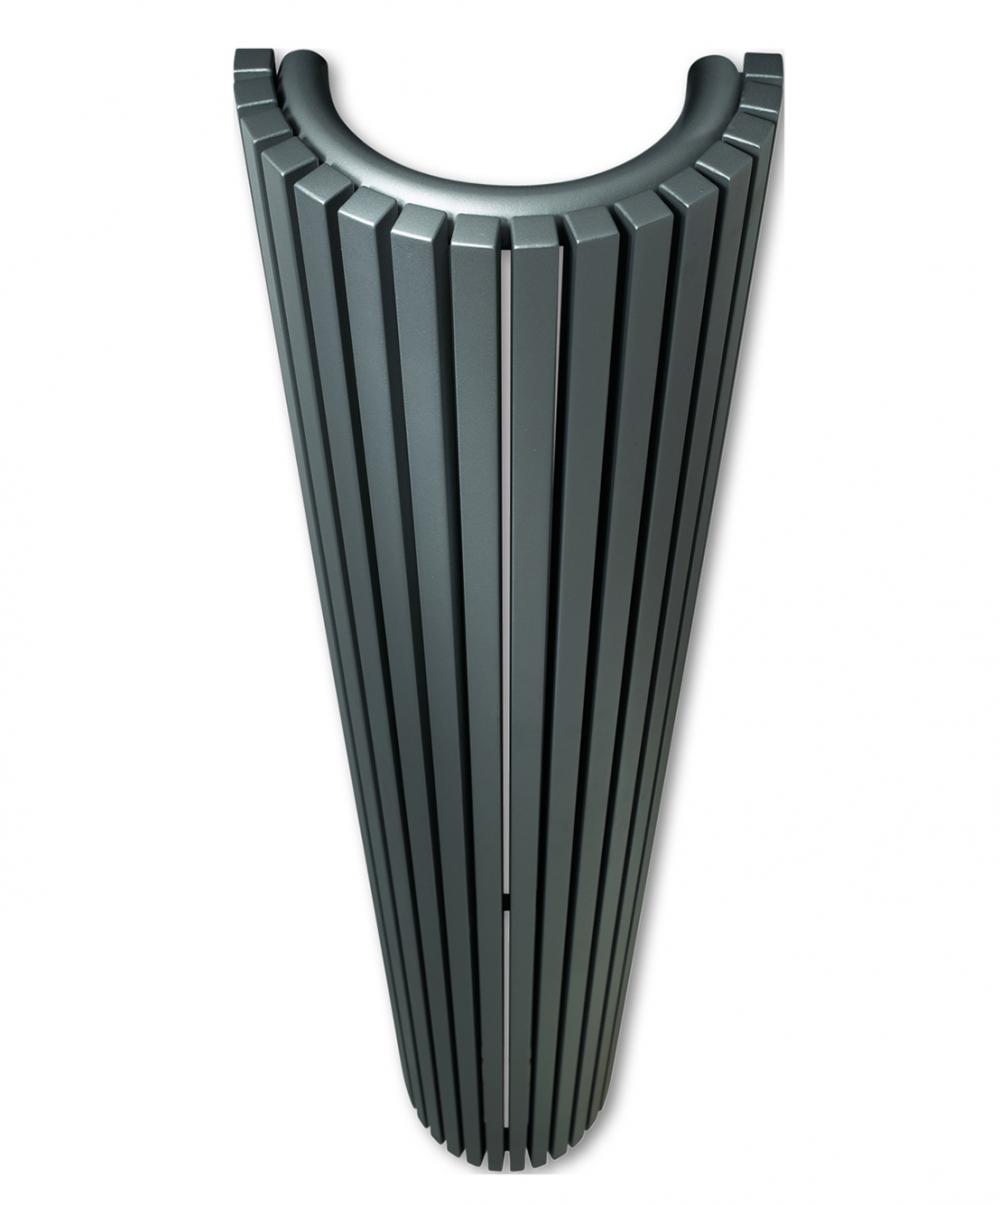 Calorifere decorative semirotunde Vasco Carre CR-O 2200x350 mm, 1823 W